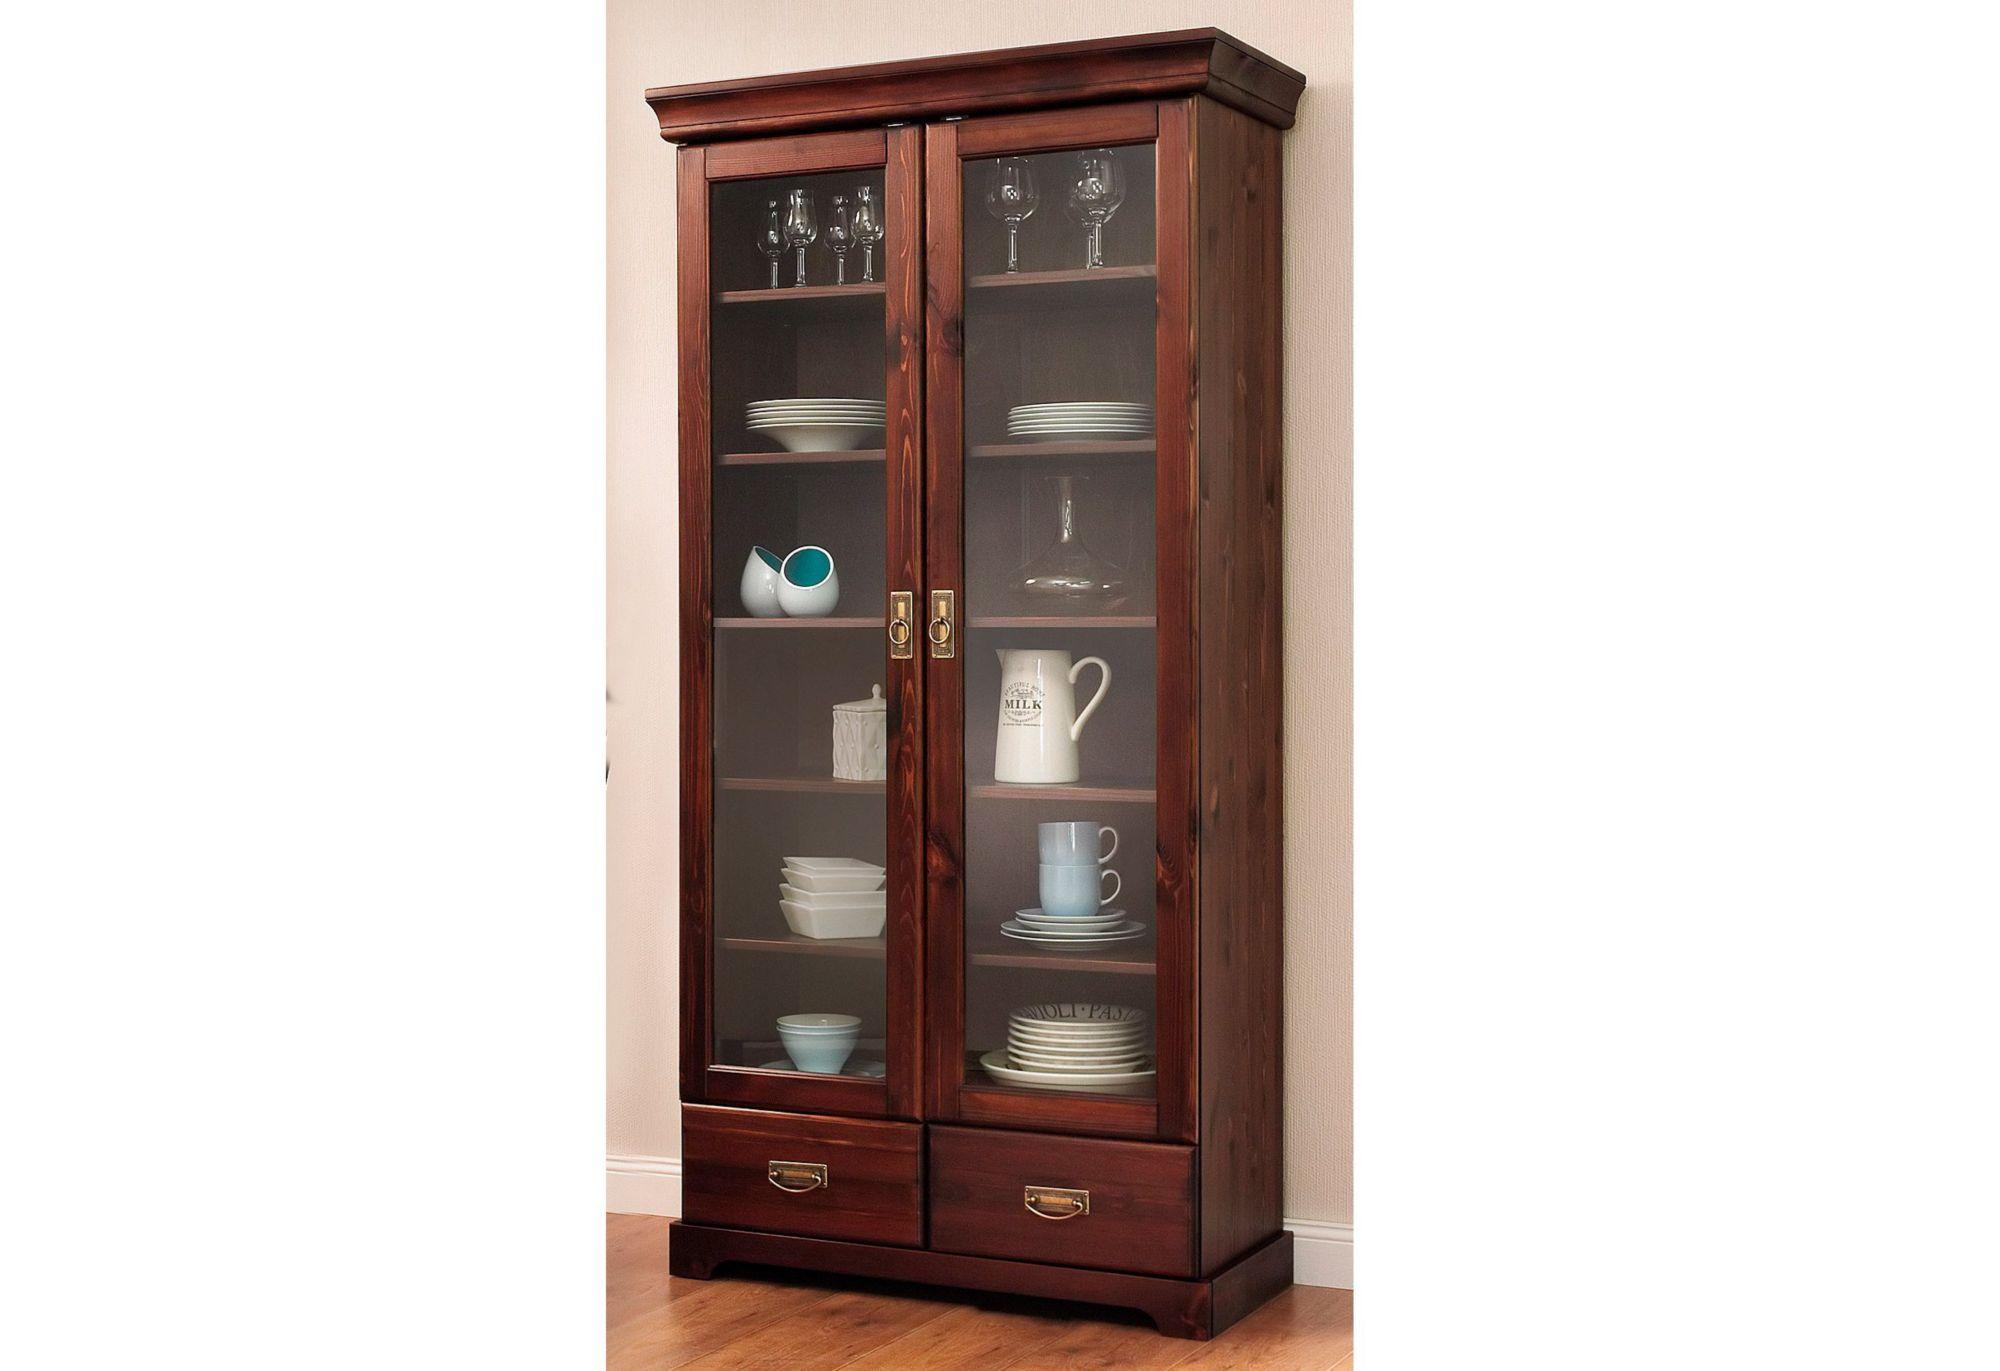 vitrine home affaire h he 180 cm schwab versand kommoden. Black Bedroom Furniture Sets. Home Design Ideas